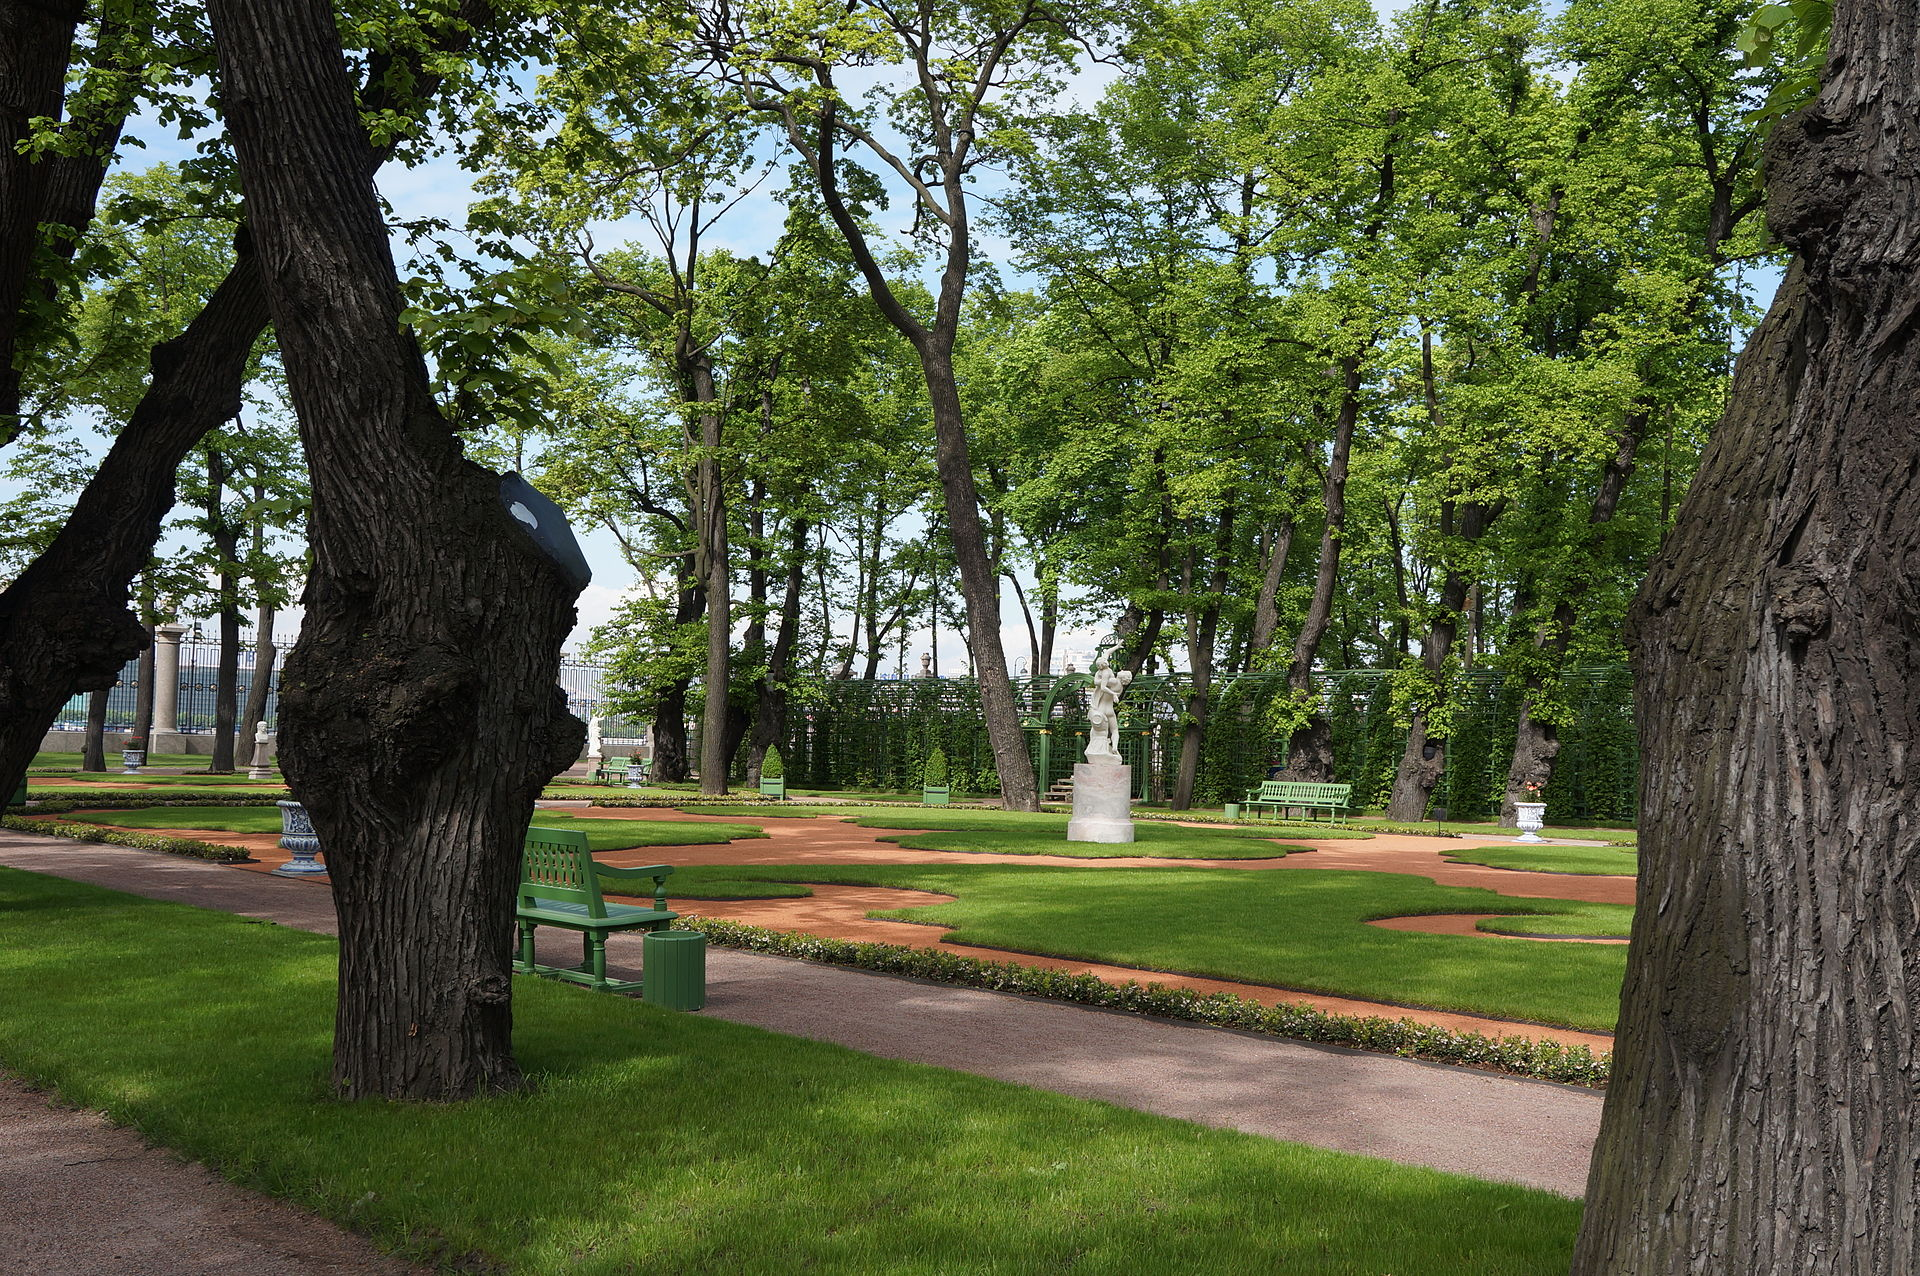 Летний сад. Французский партер от Лебяжей канавки. 2012 г. Автор фото: Евгений Со (Wikimedia Commons)